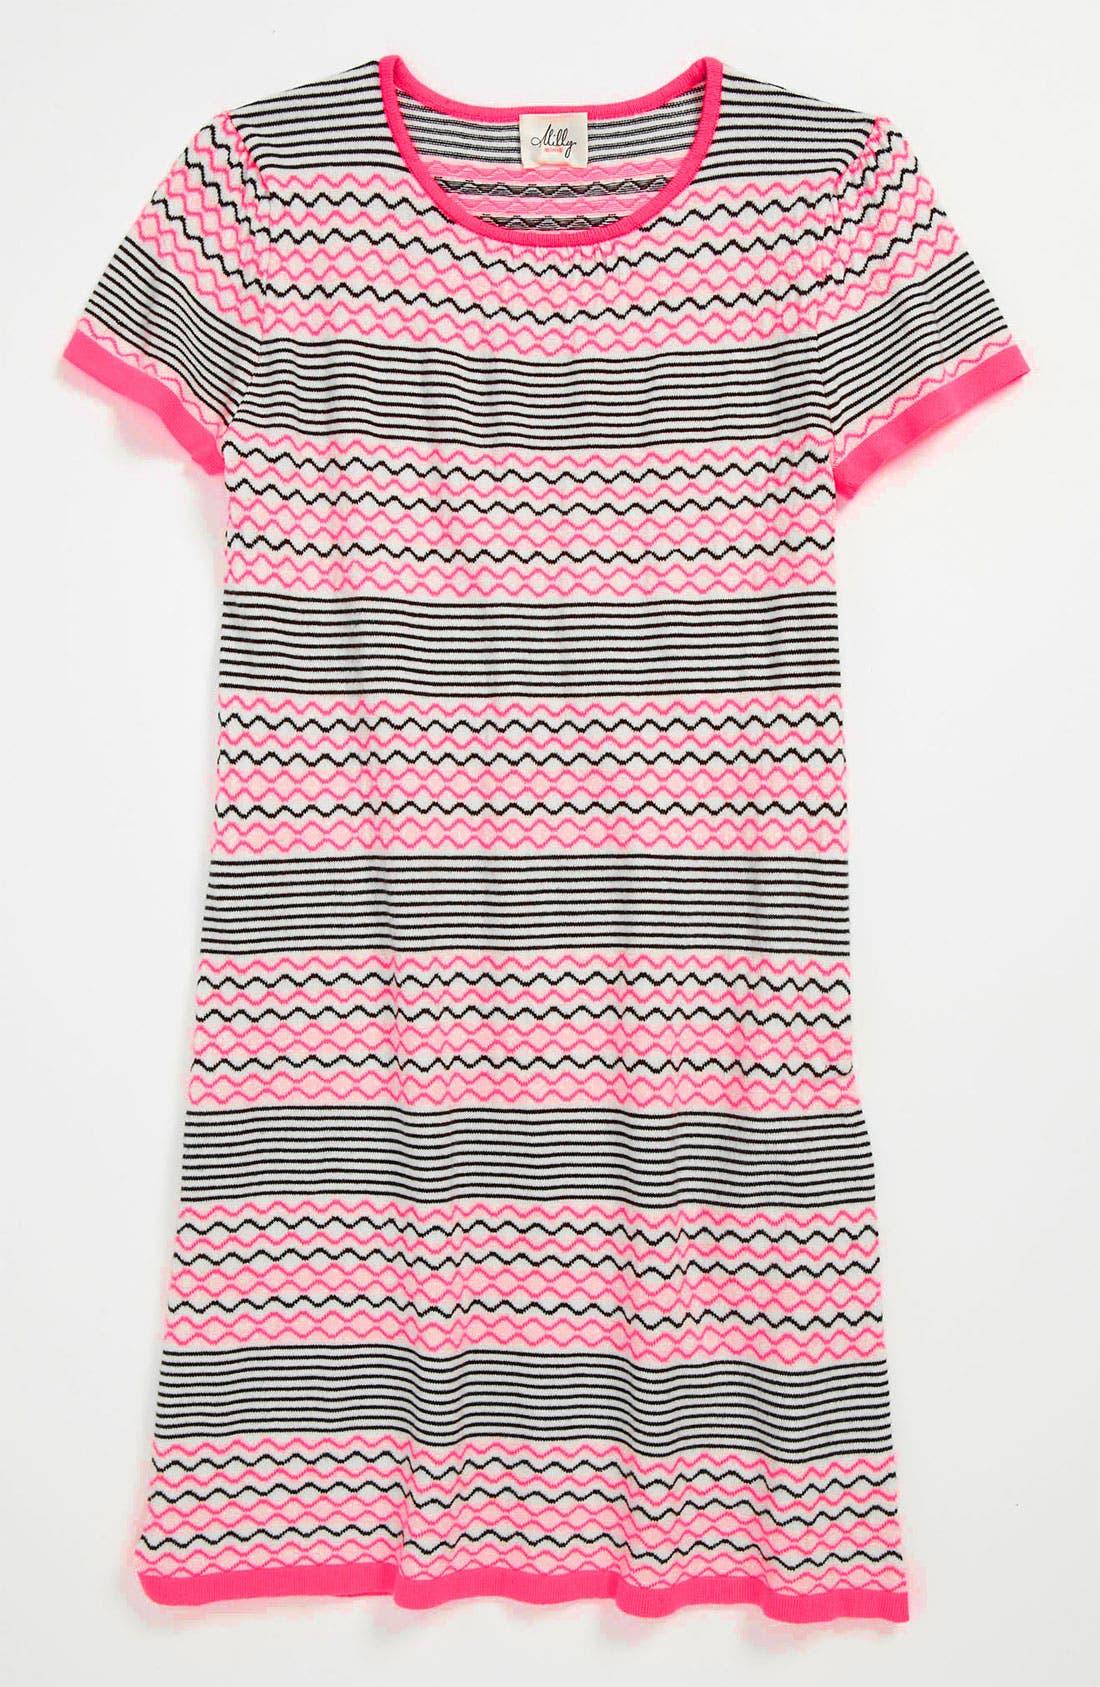 Main Image - Milly Minis Knit Dress (Little Girls & Big Girls)